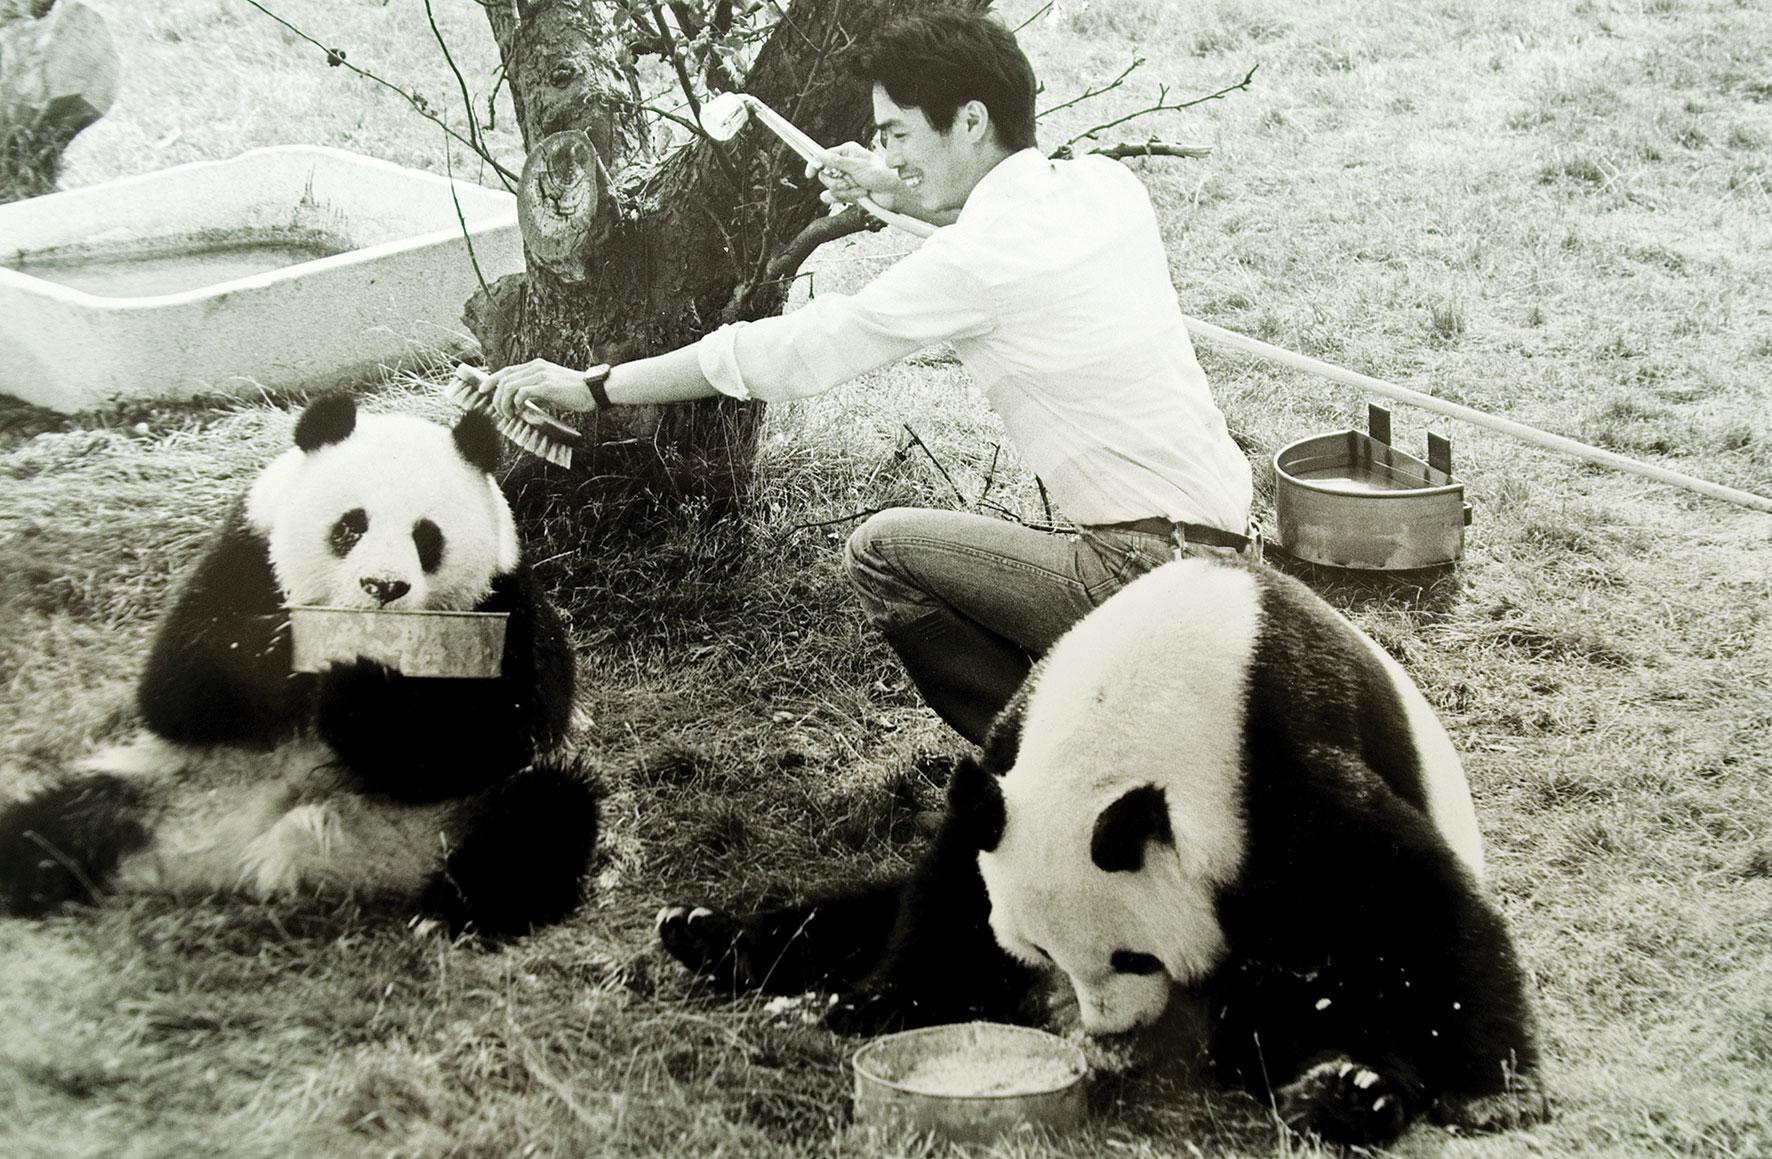 beekse-bergen-safari-panda-bezoek.jpg